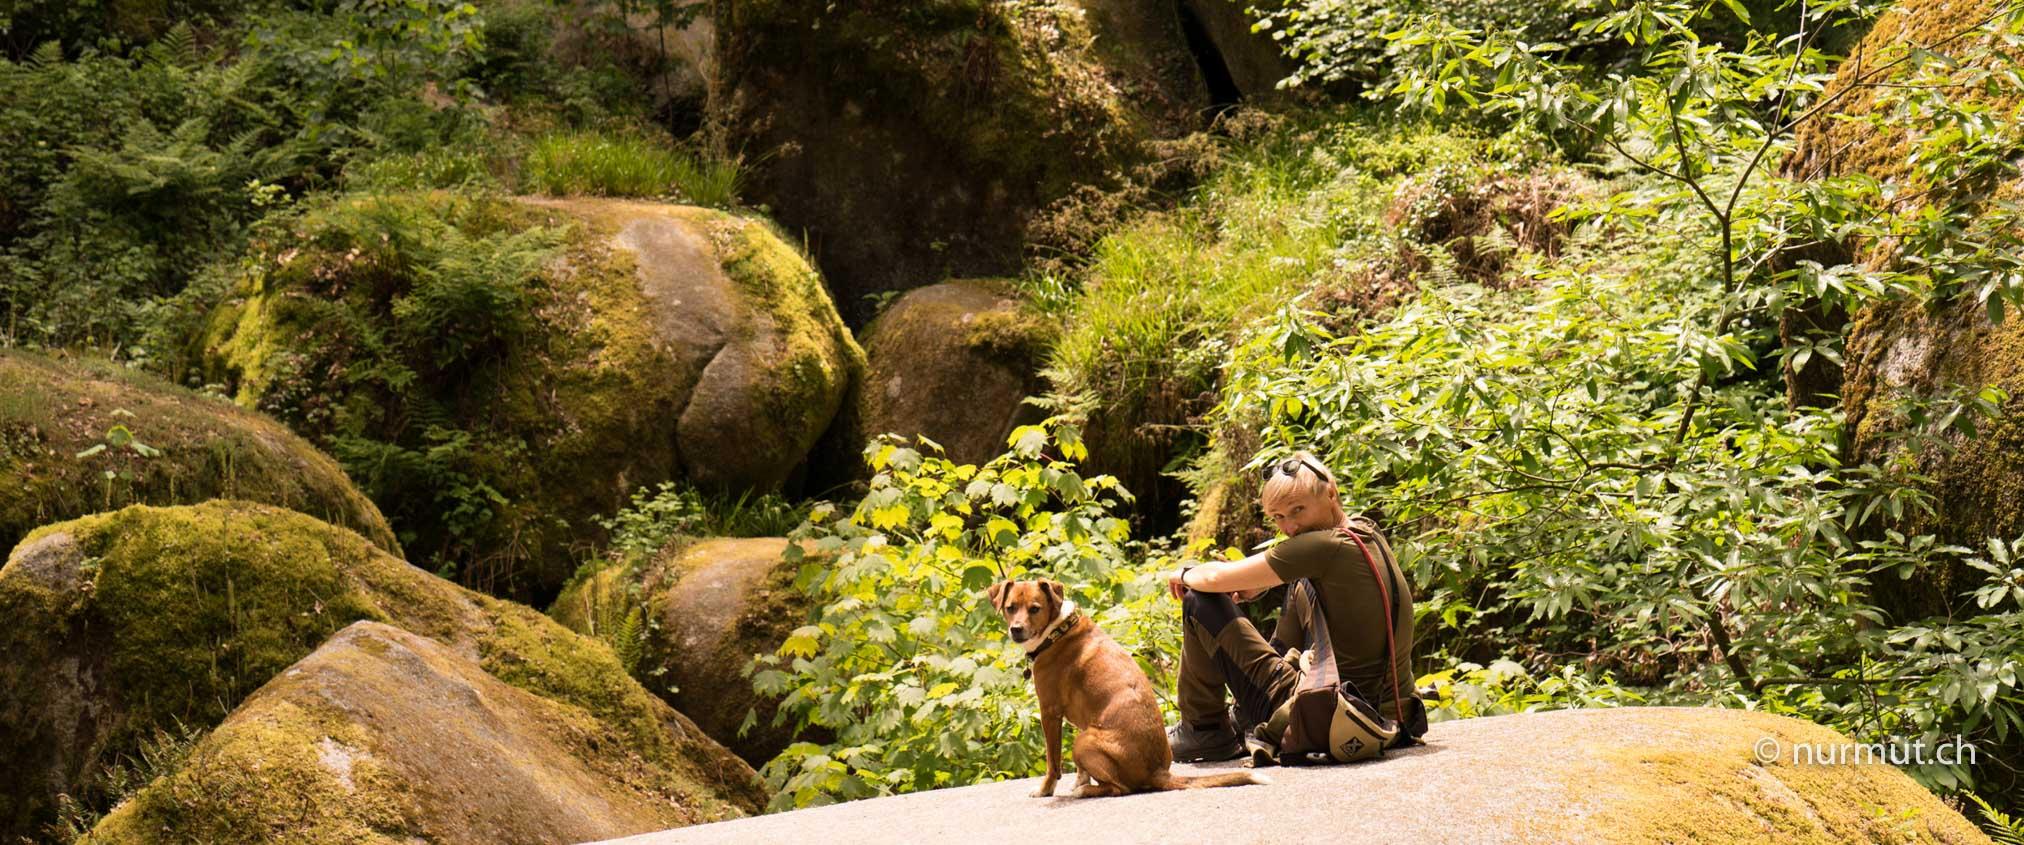 Bretagen-mit-Hund-Huelgoat-Zauberwald